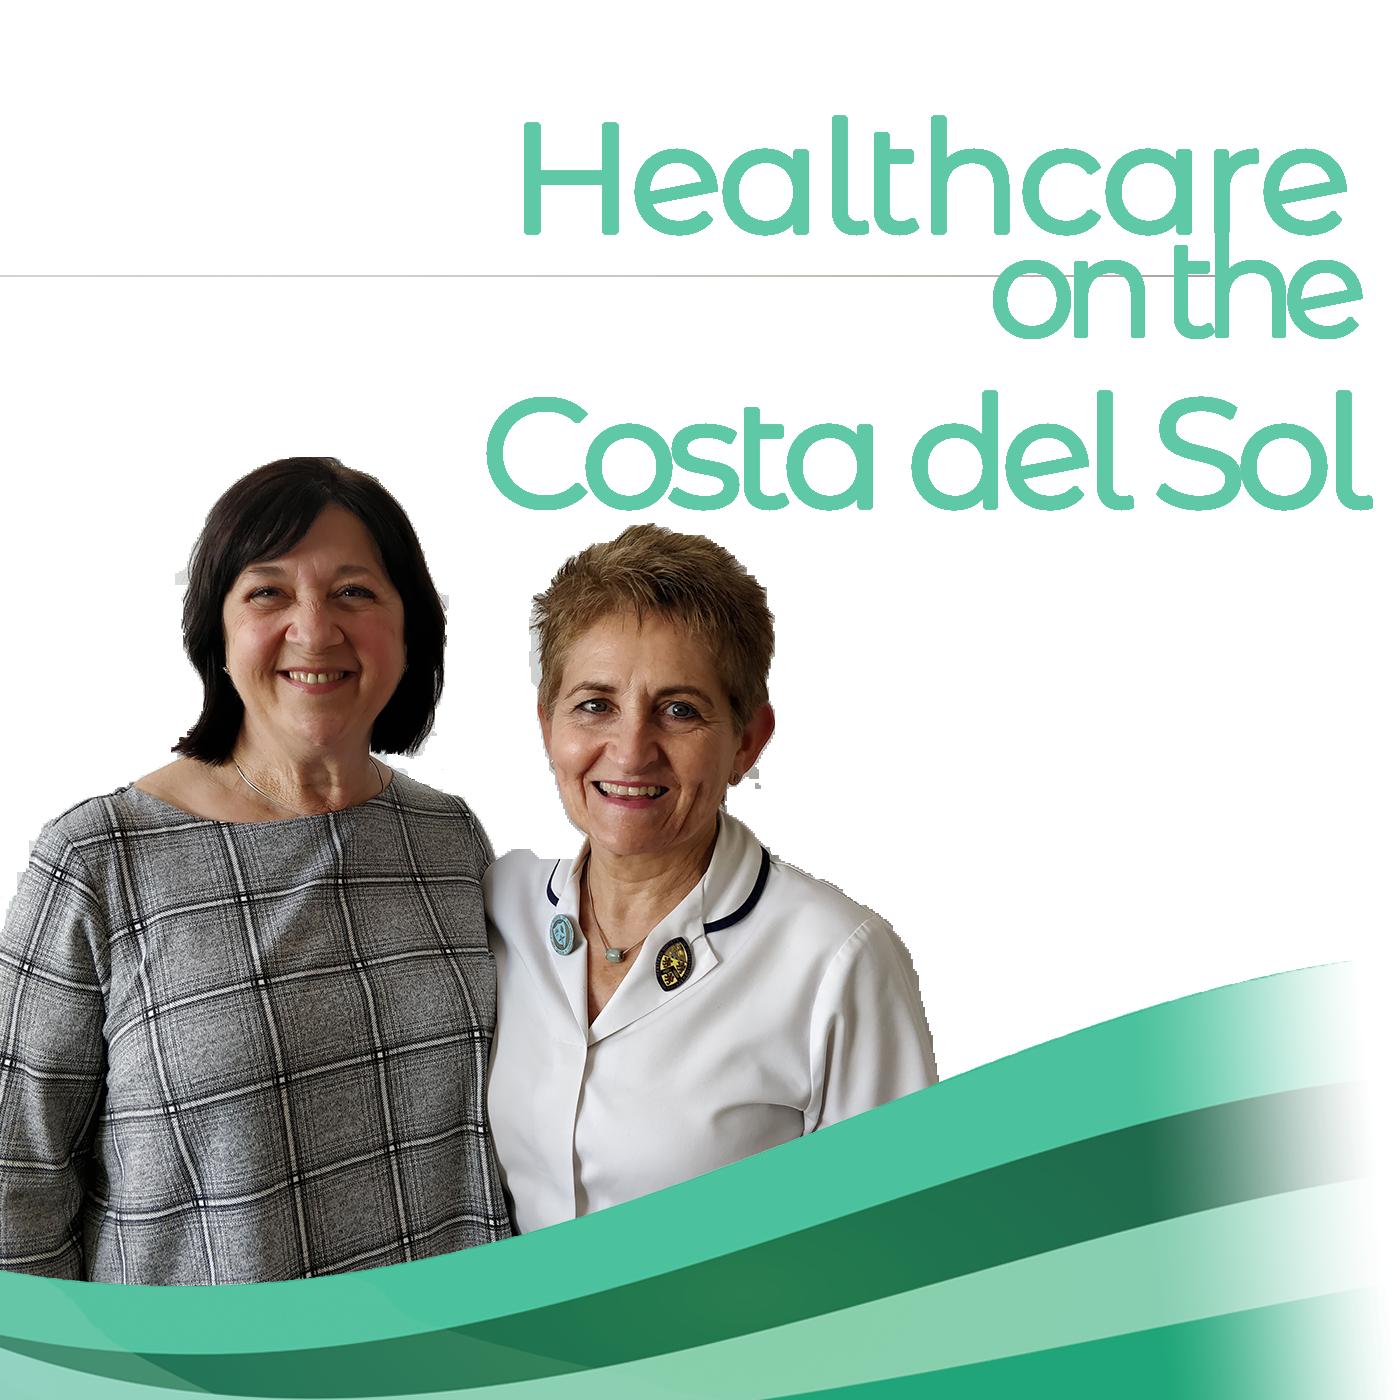 Podcast Episode 6 - Health Insurance on the Costa del Sol